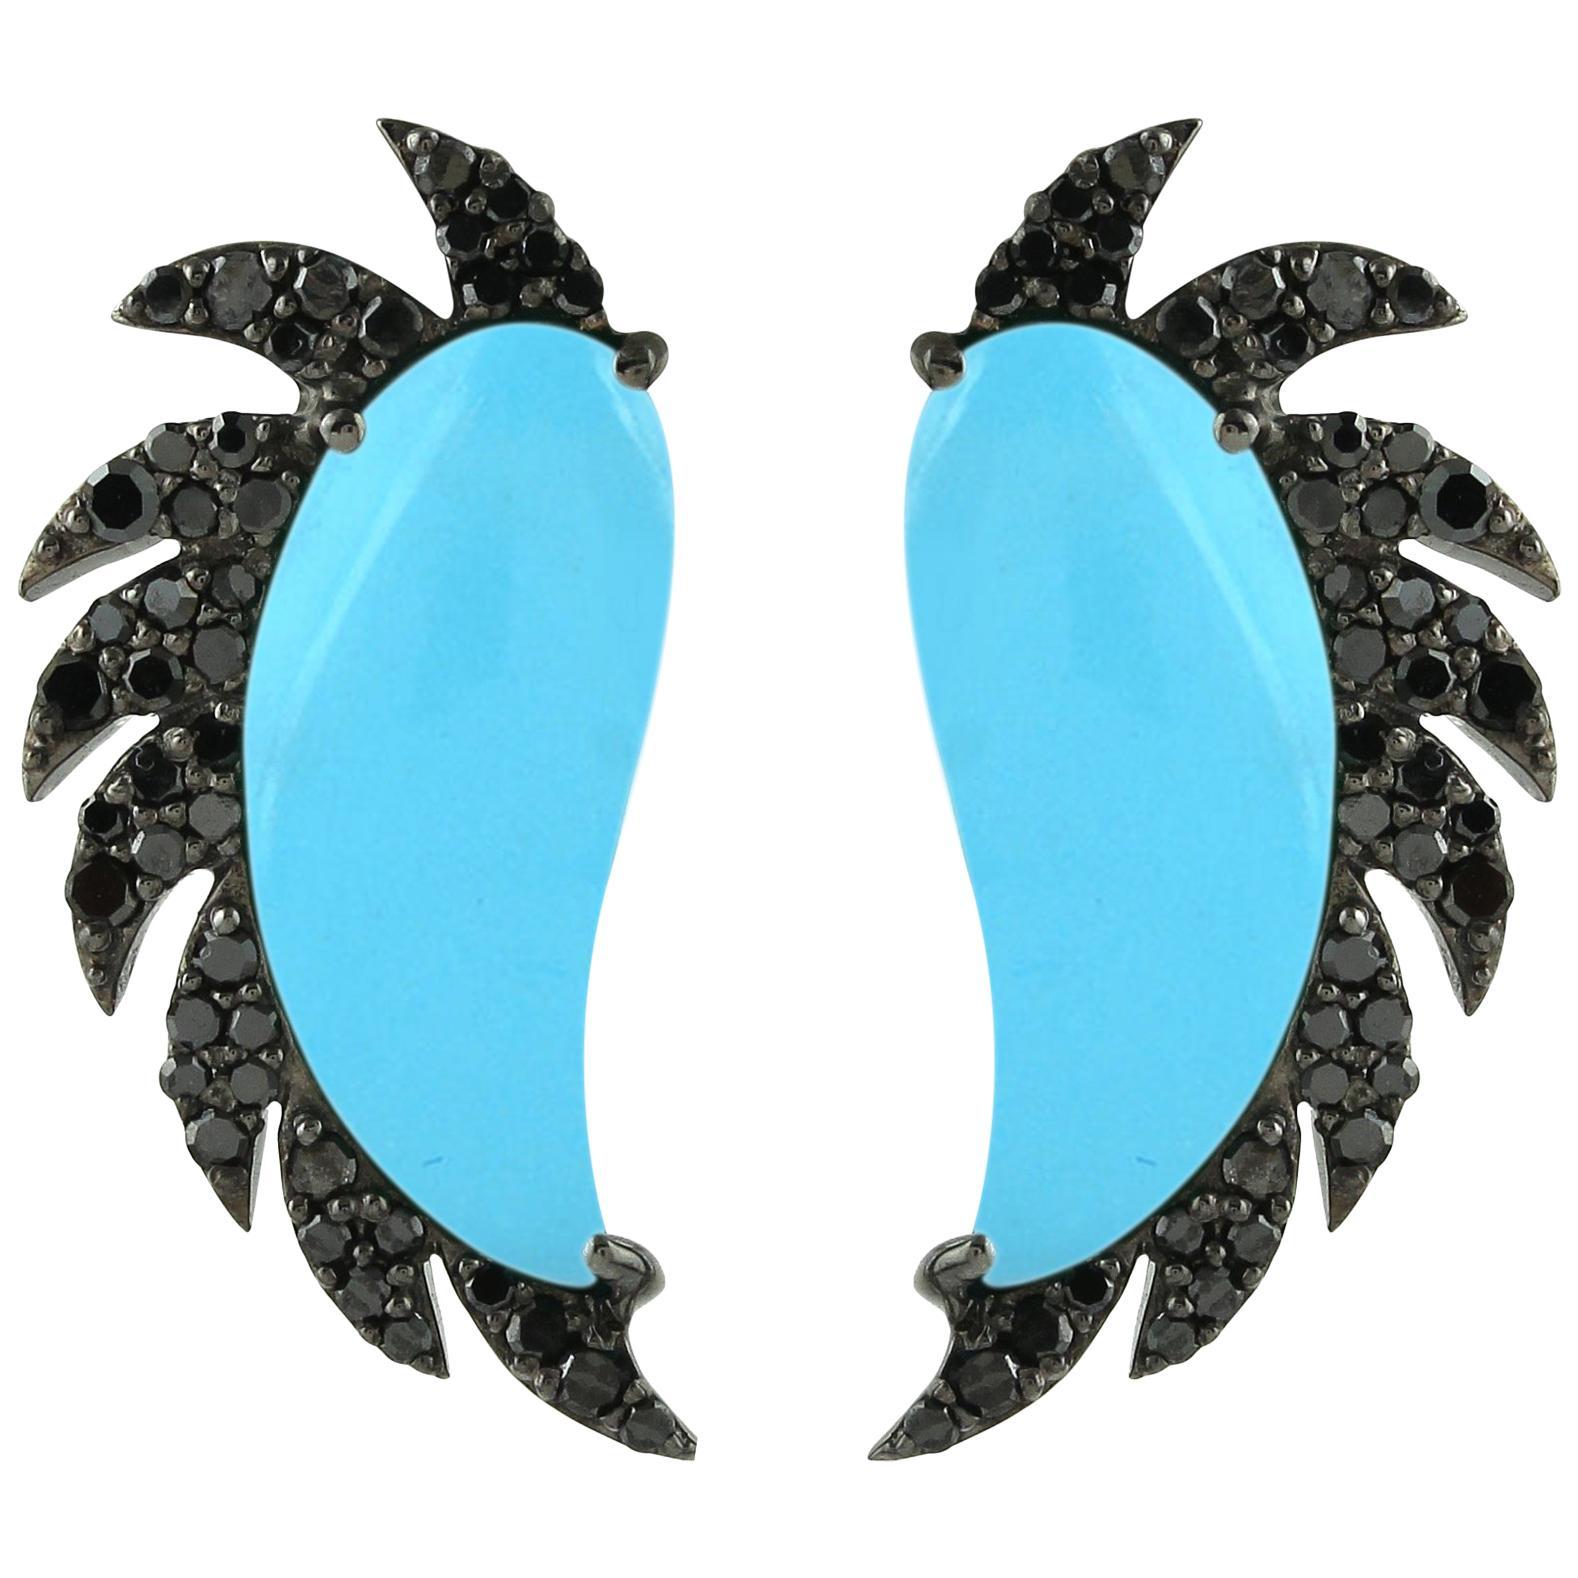 Turquoise Black Diamonds Meghna Jewels Claw Half Moon Studs